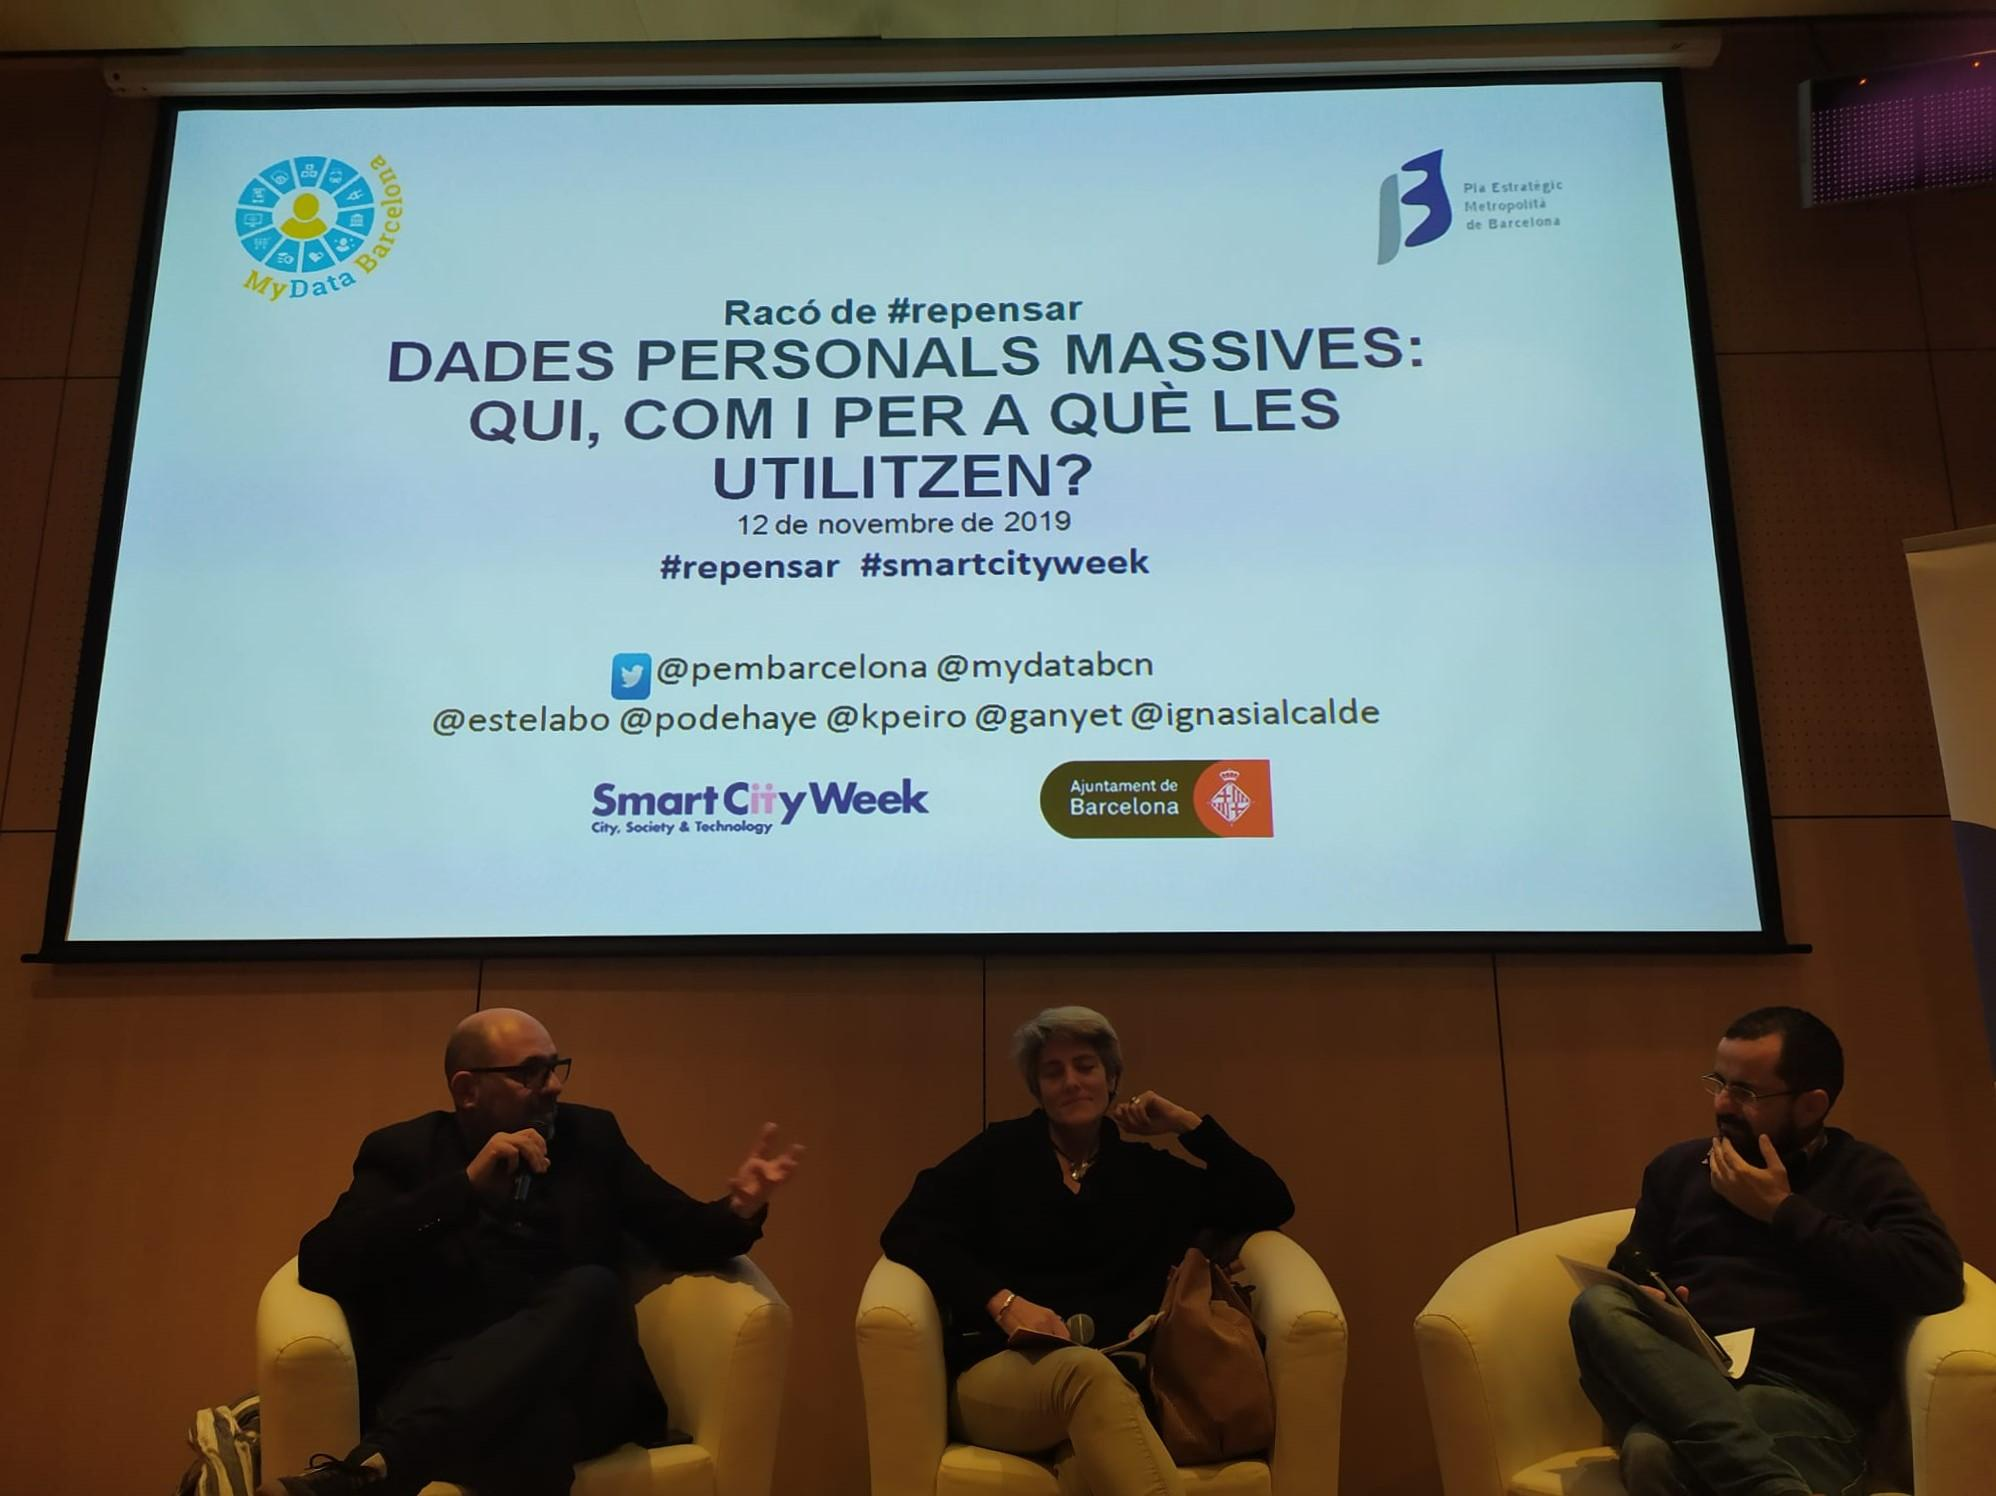 Josep Maria Ganyet, Karma Peiró e Ignasi Alcalde durante el debate